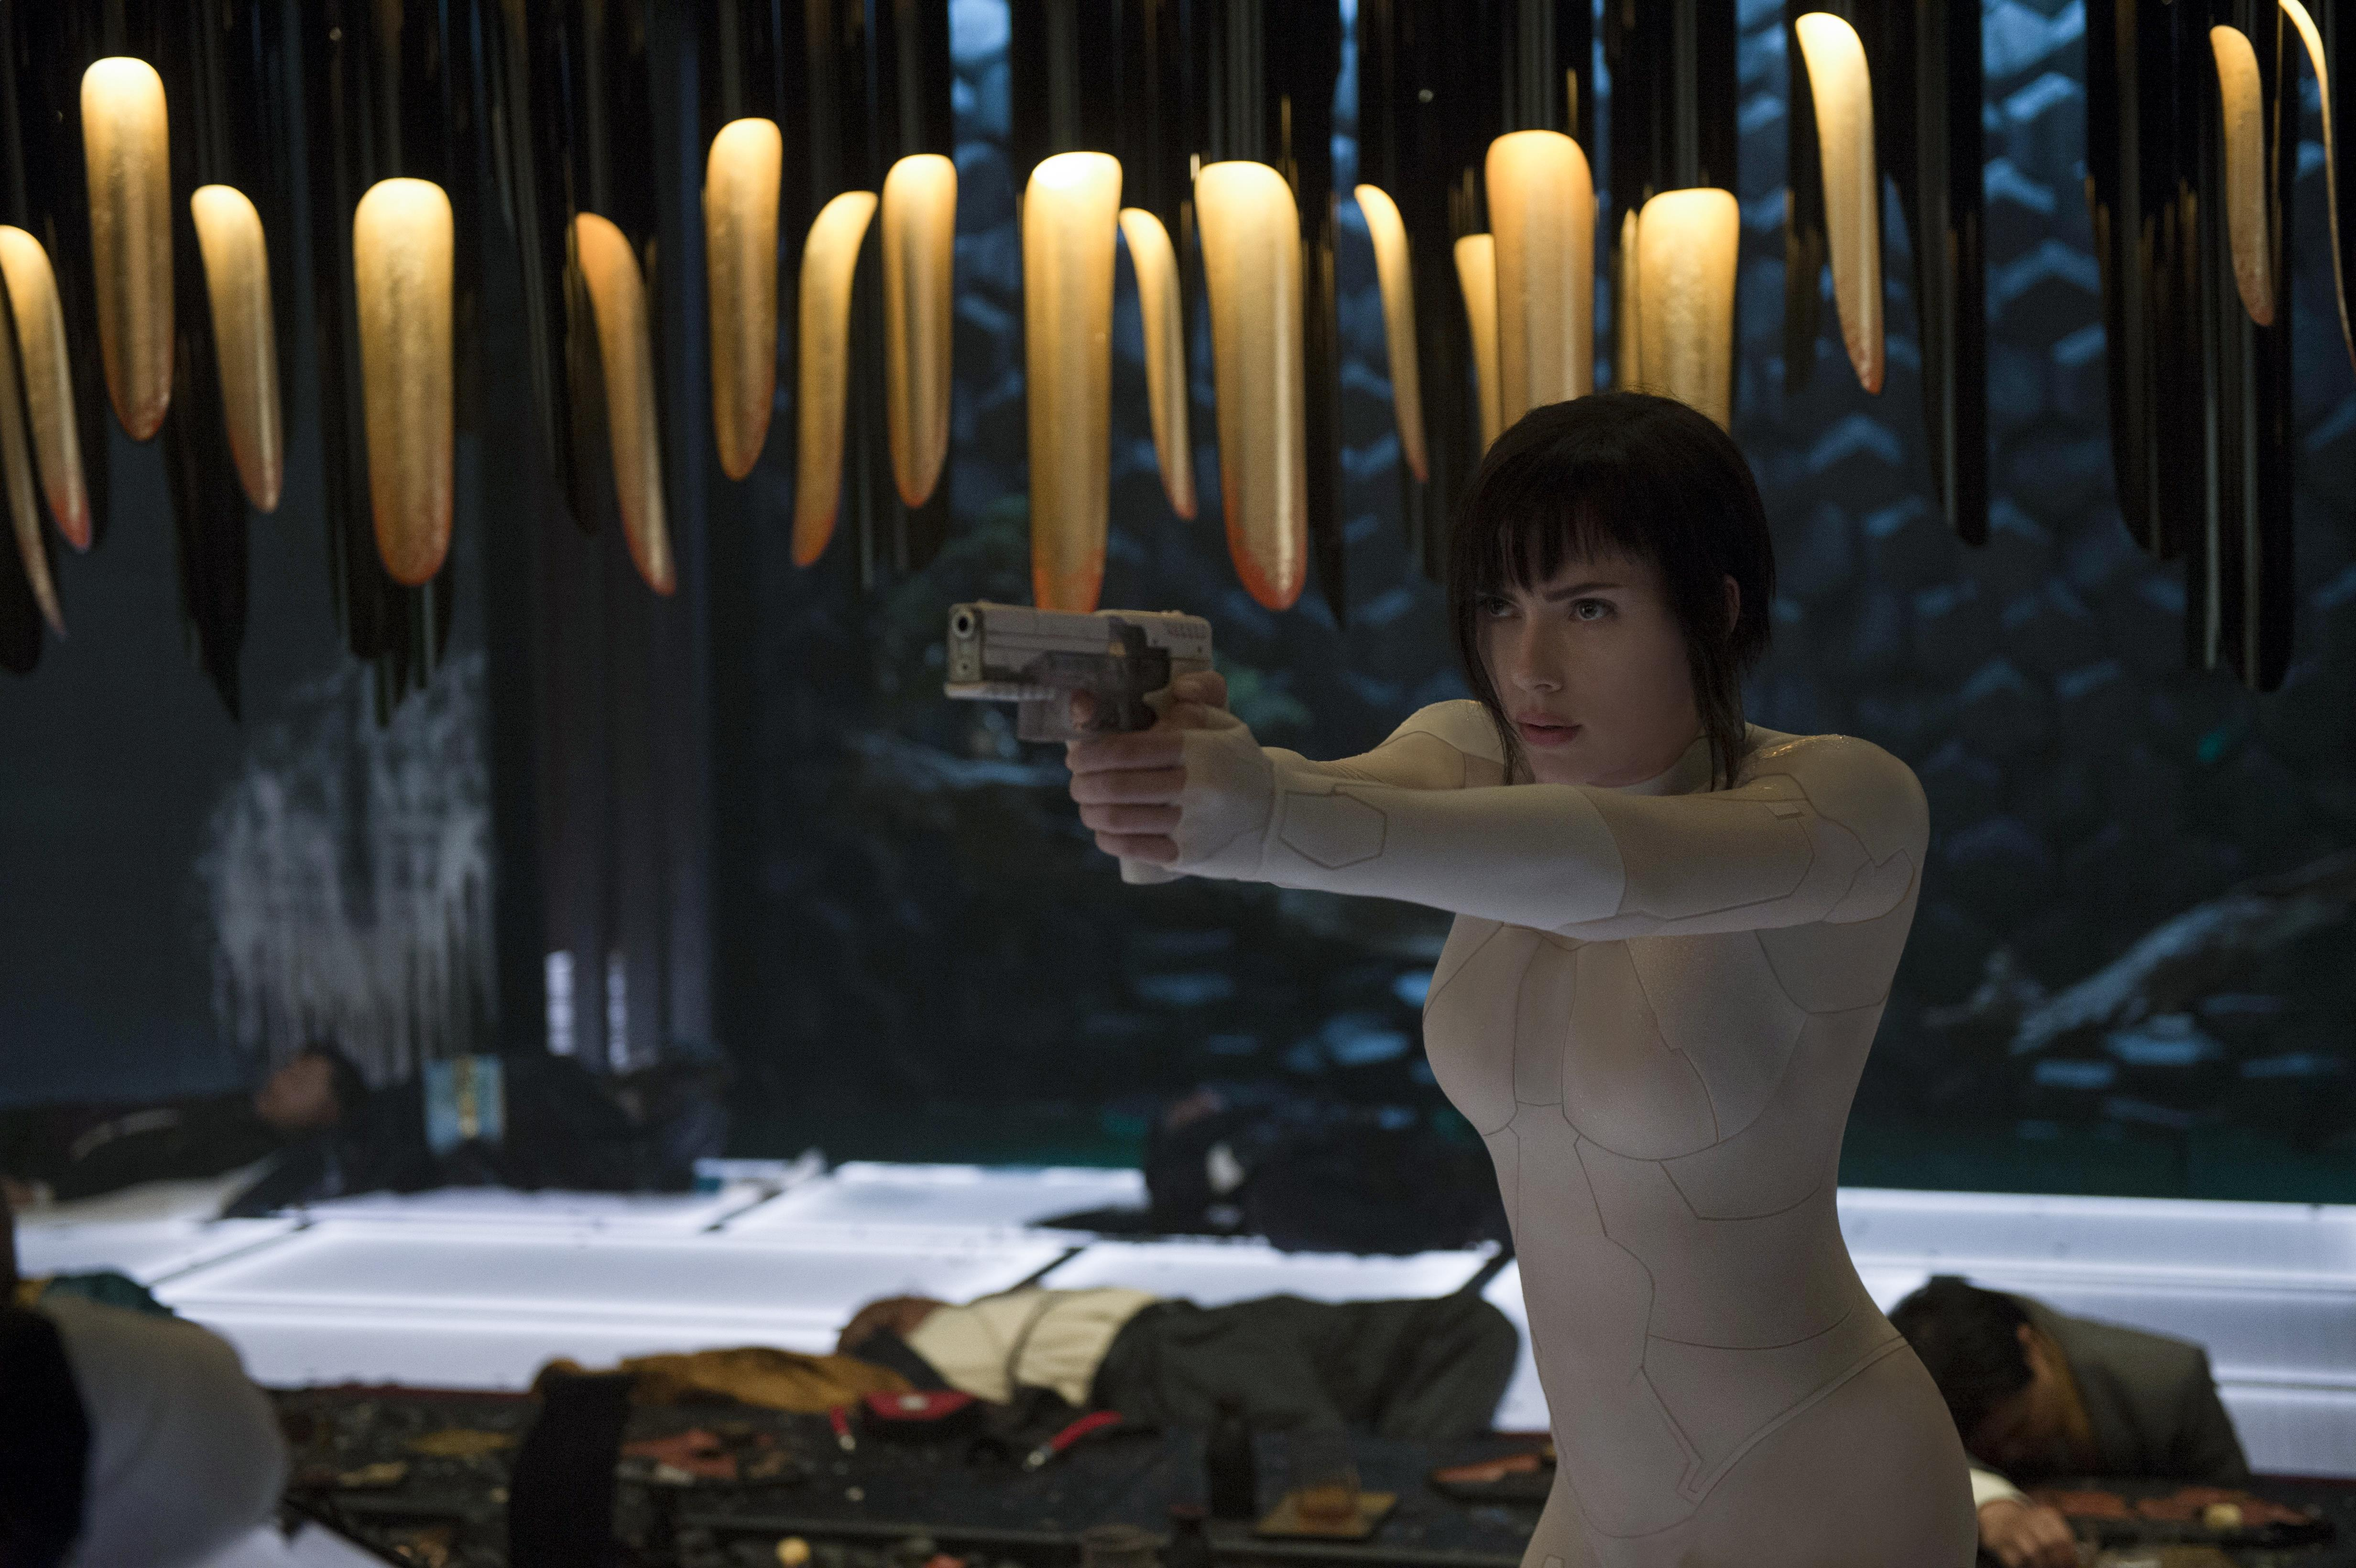 Scarlett Johansson Ghost In The Shell 2017 Movie, HD